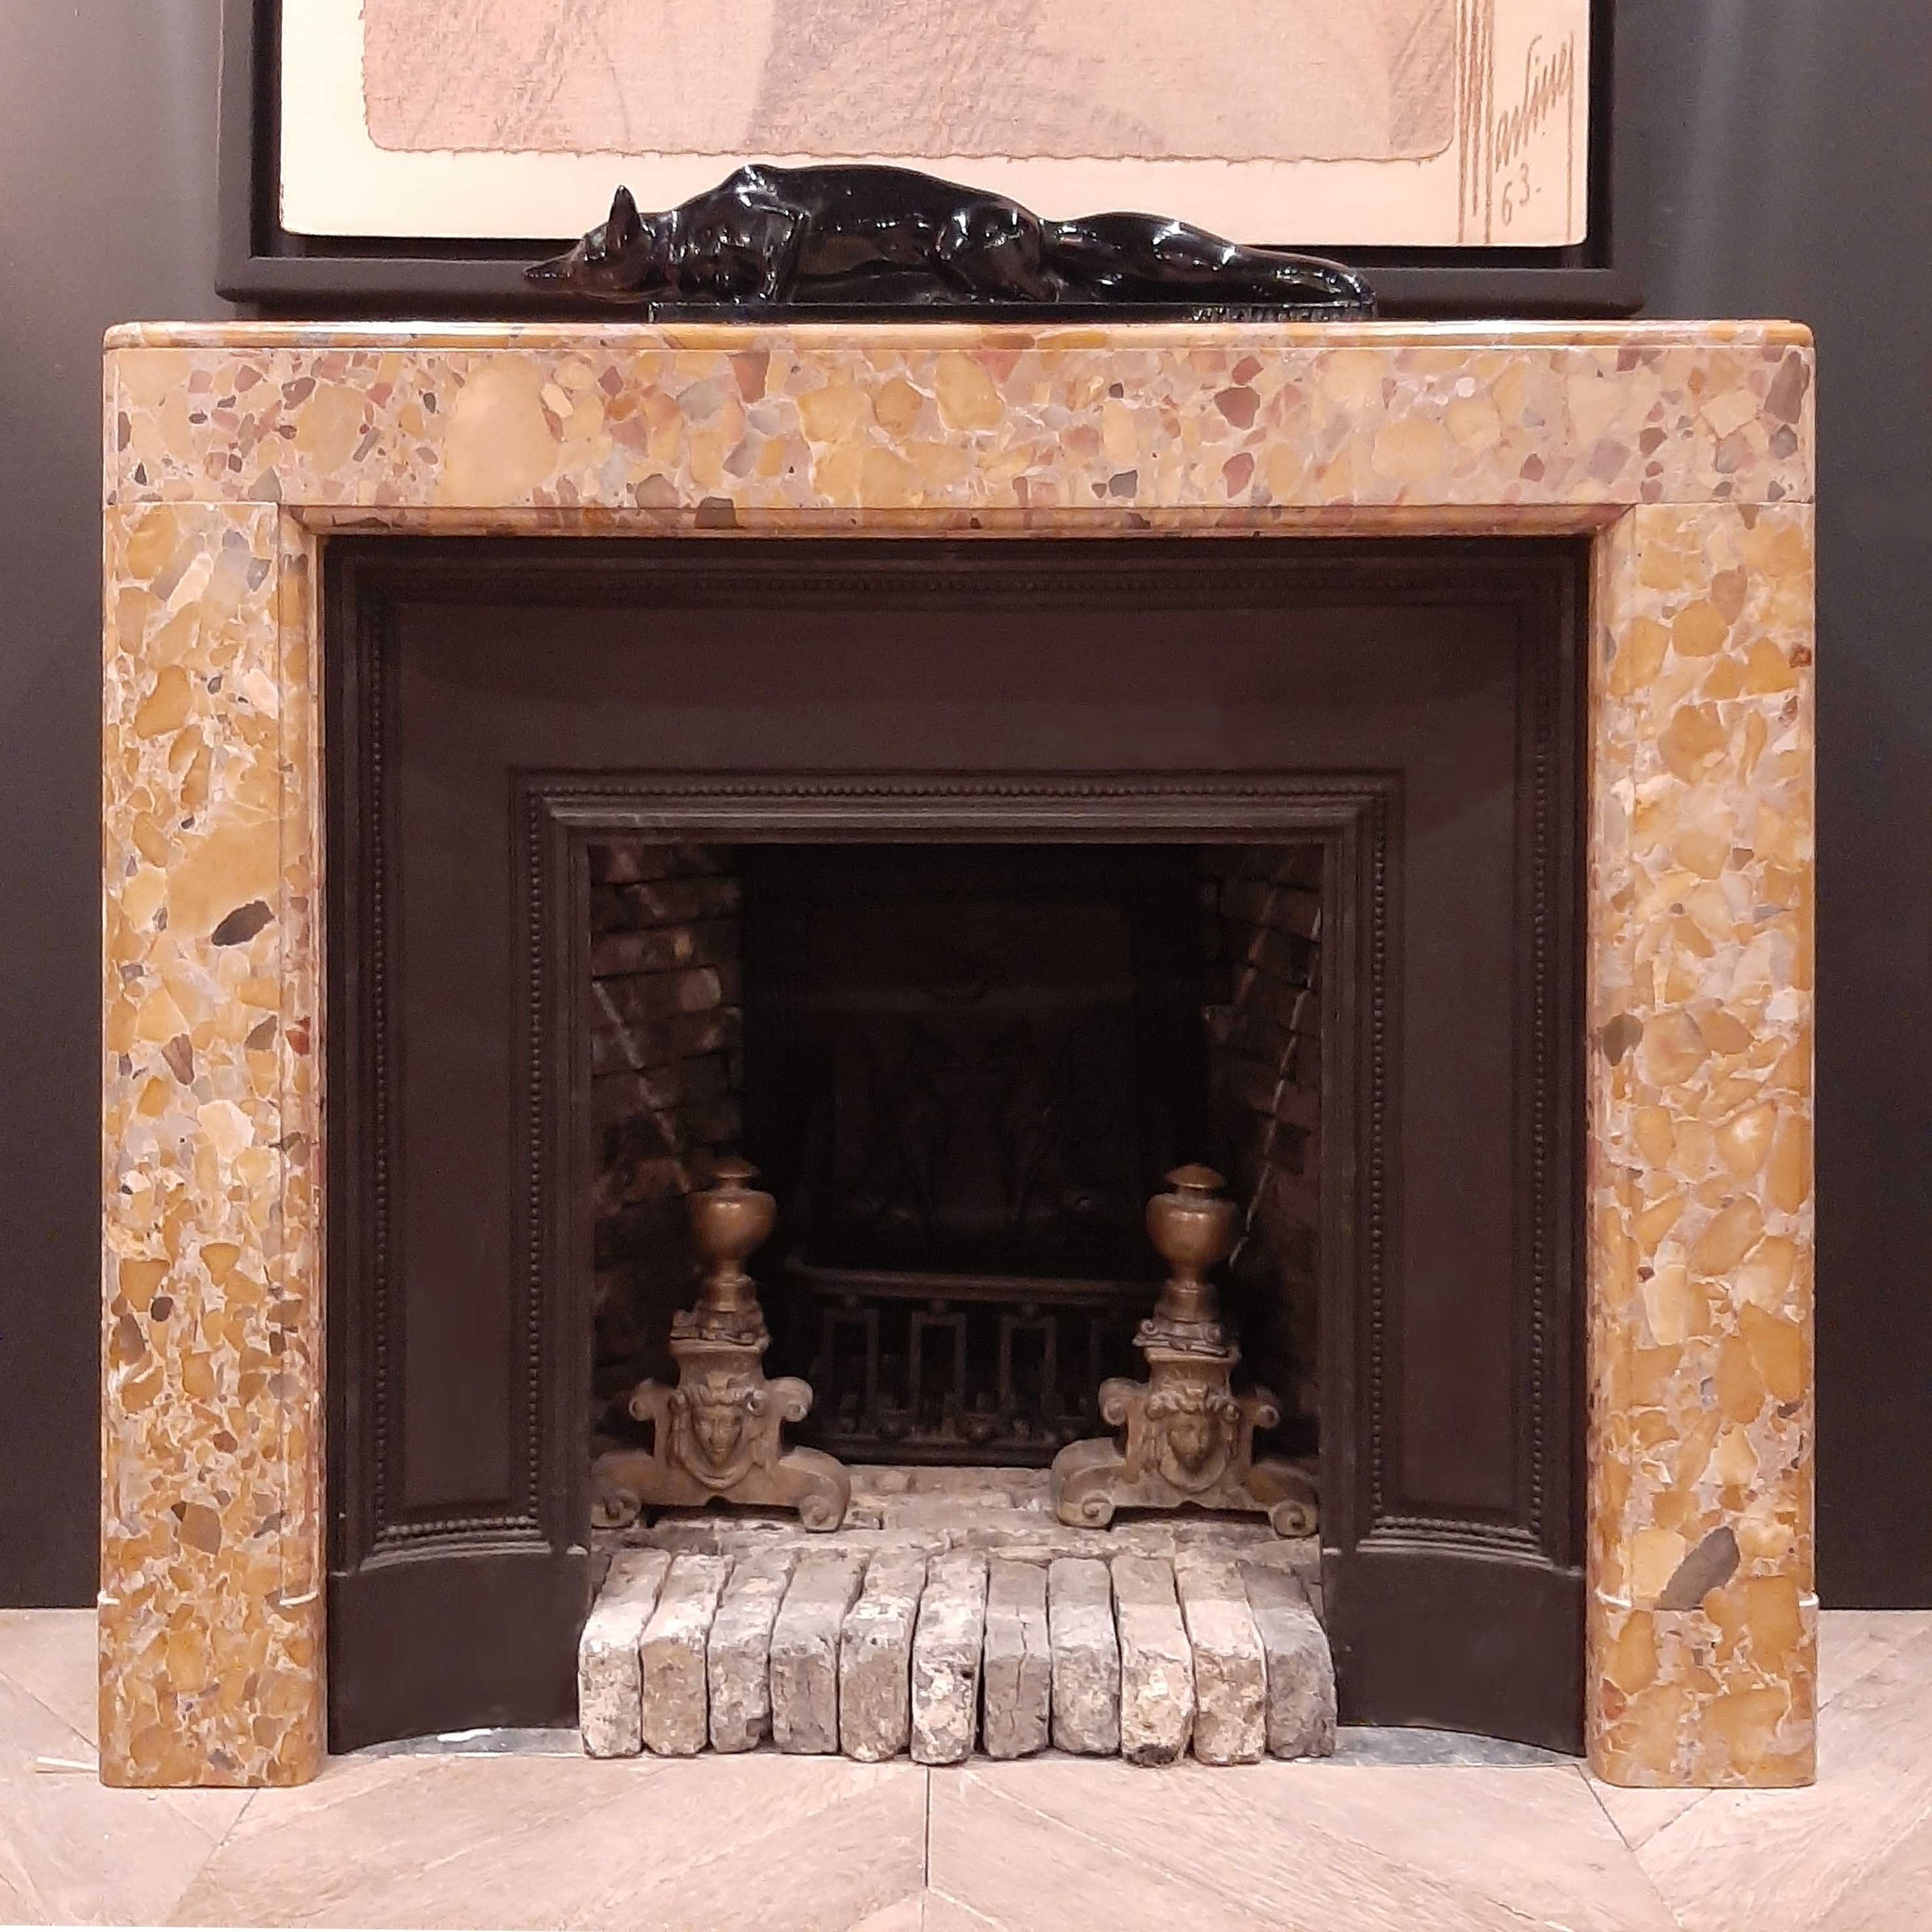 Marmor Art Deco Kamin mit originalem Interieur aus Gusseisen